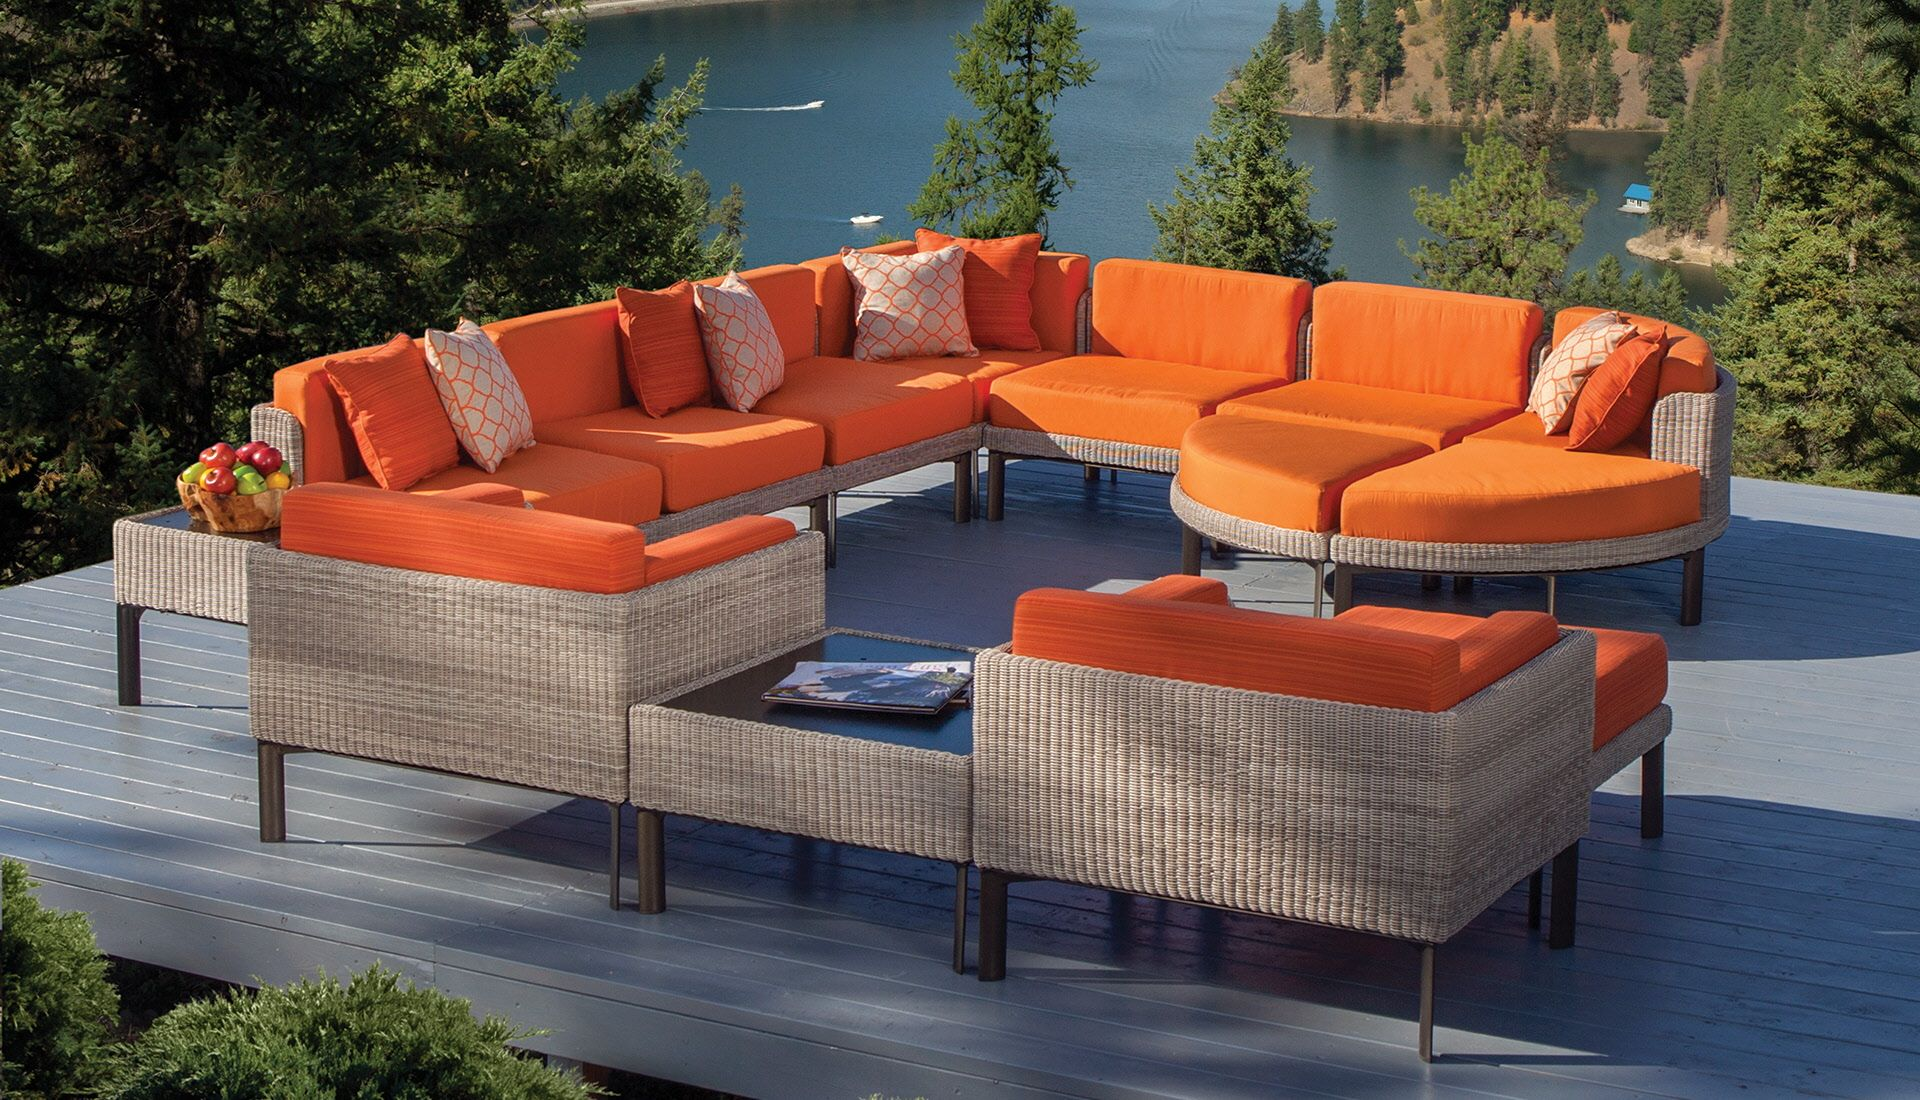 Outdoor Furniture Casual Furniture Patio Furniture Garden